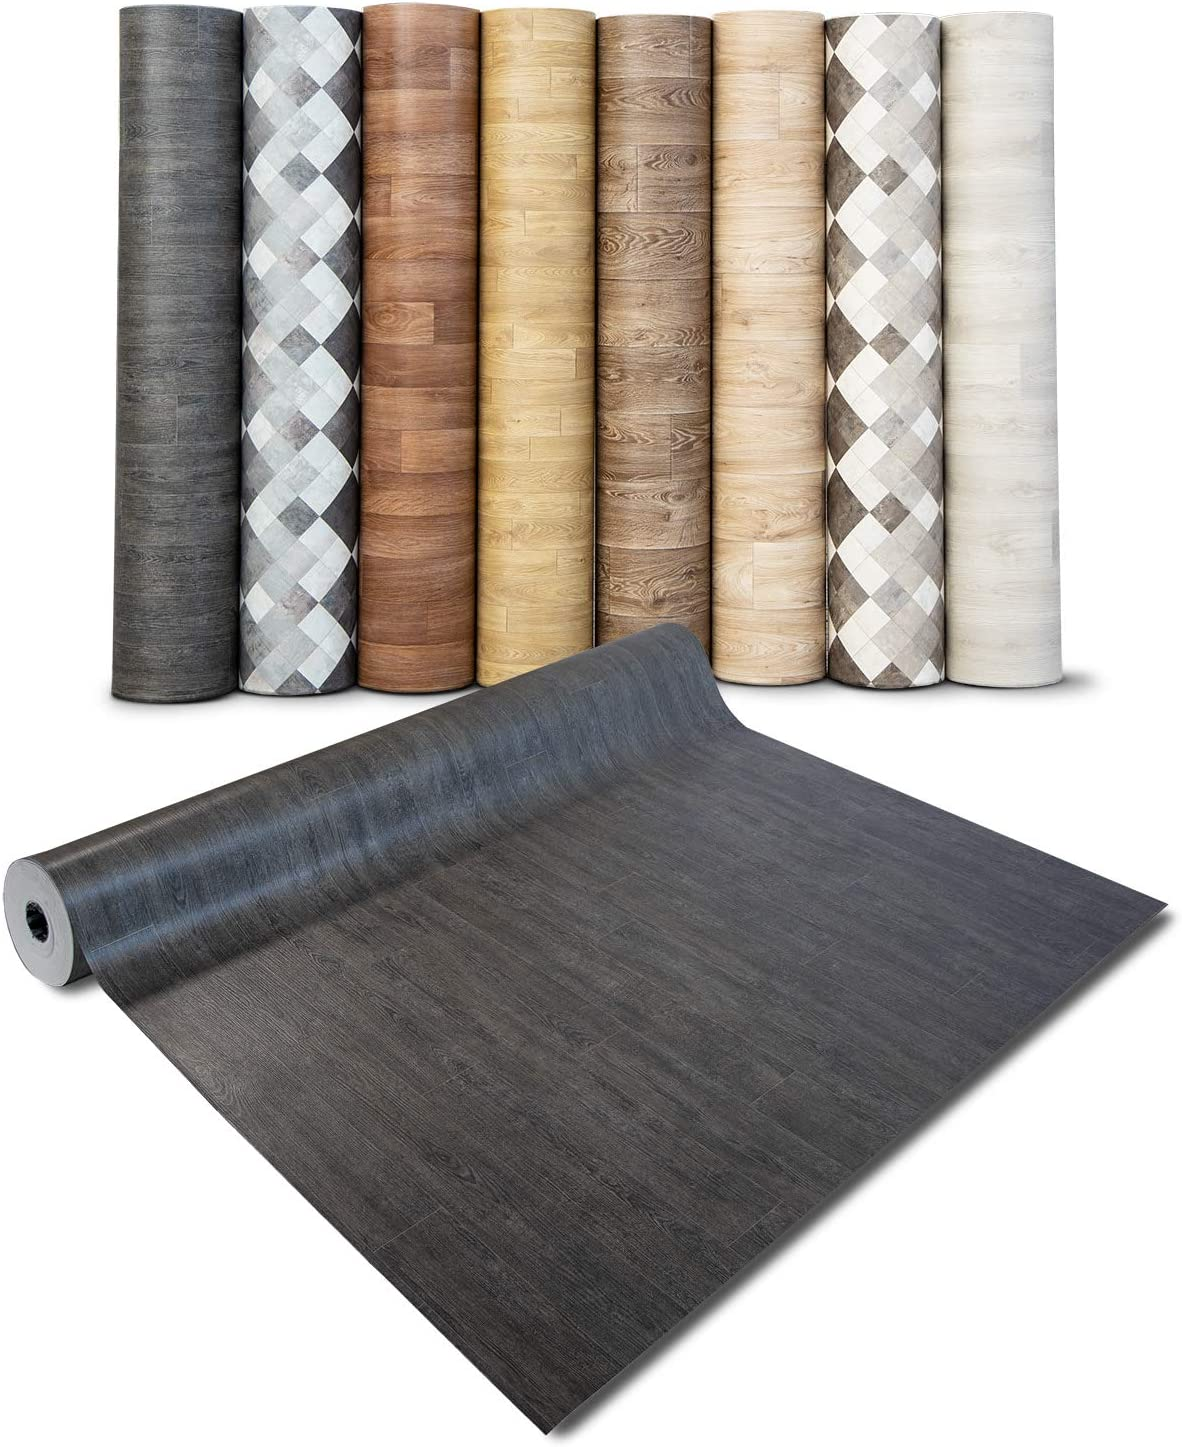 extra abriebfester PVC Bodenbelag 100x250 cm Meterware casa pura/® CV Bodenbelag Vancouver - Eiche Vintage Dunkel edle Holzoptik gesch/äumt Oberfl/äche strukturiert